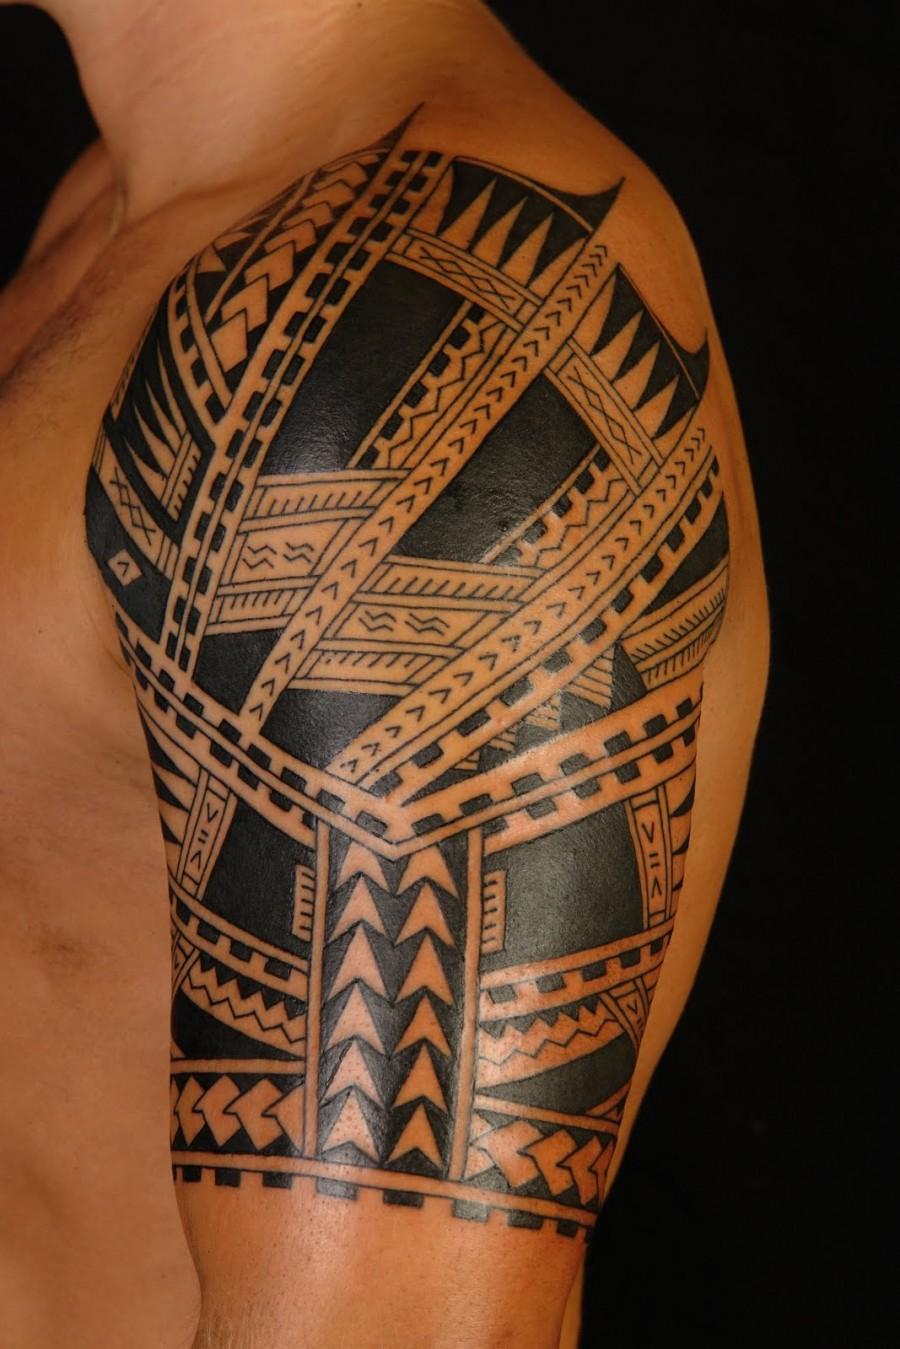 Good Shane Tattoos Half Sleeve On Upper Arm Tattoomagz throughout dimensions 900 X 1349